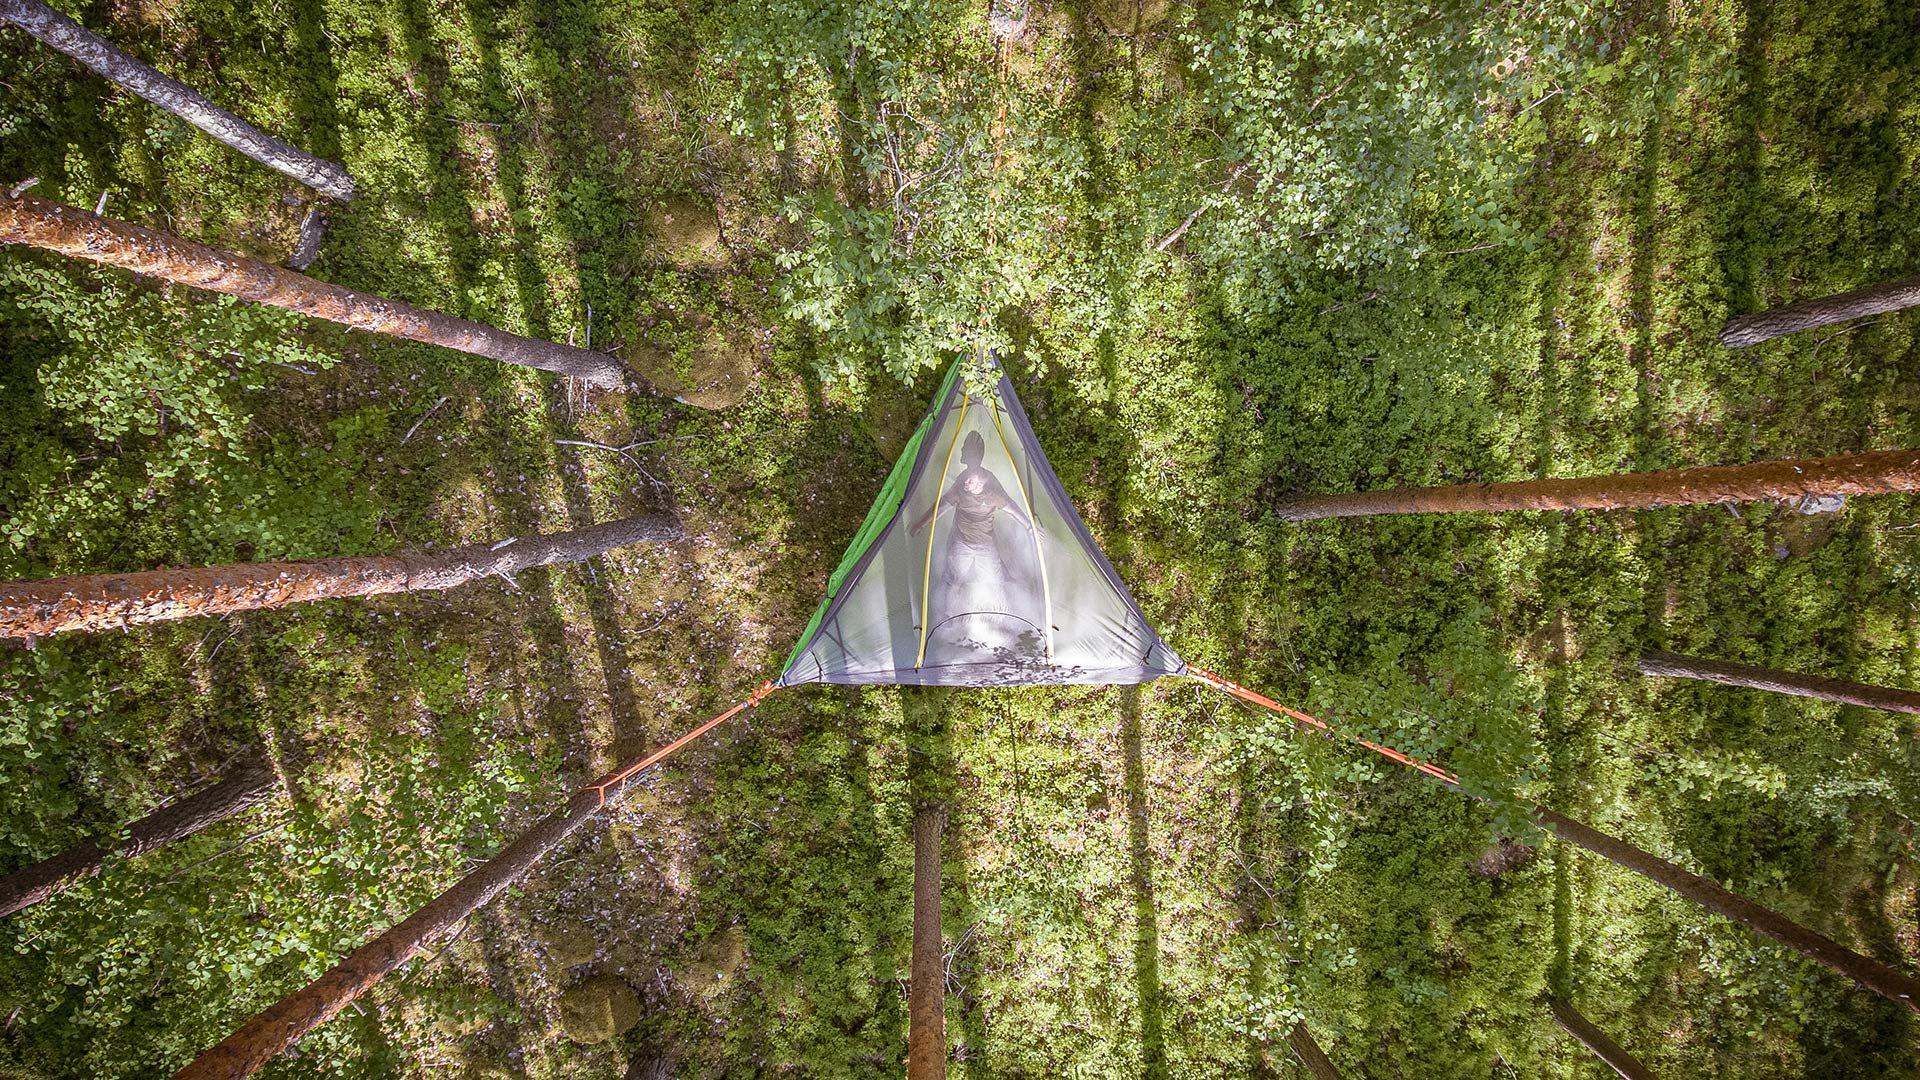 Tentsile Experience Camp Verla